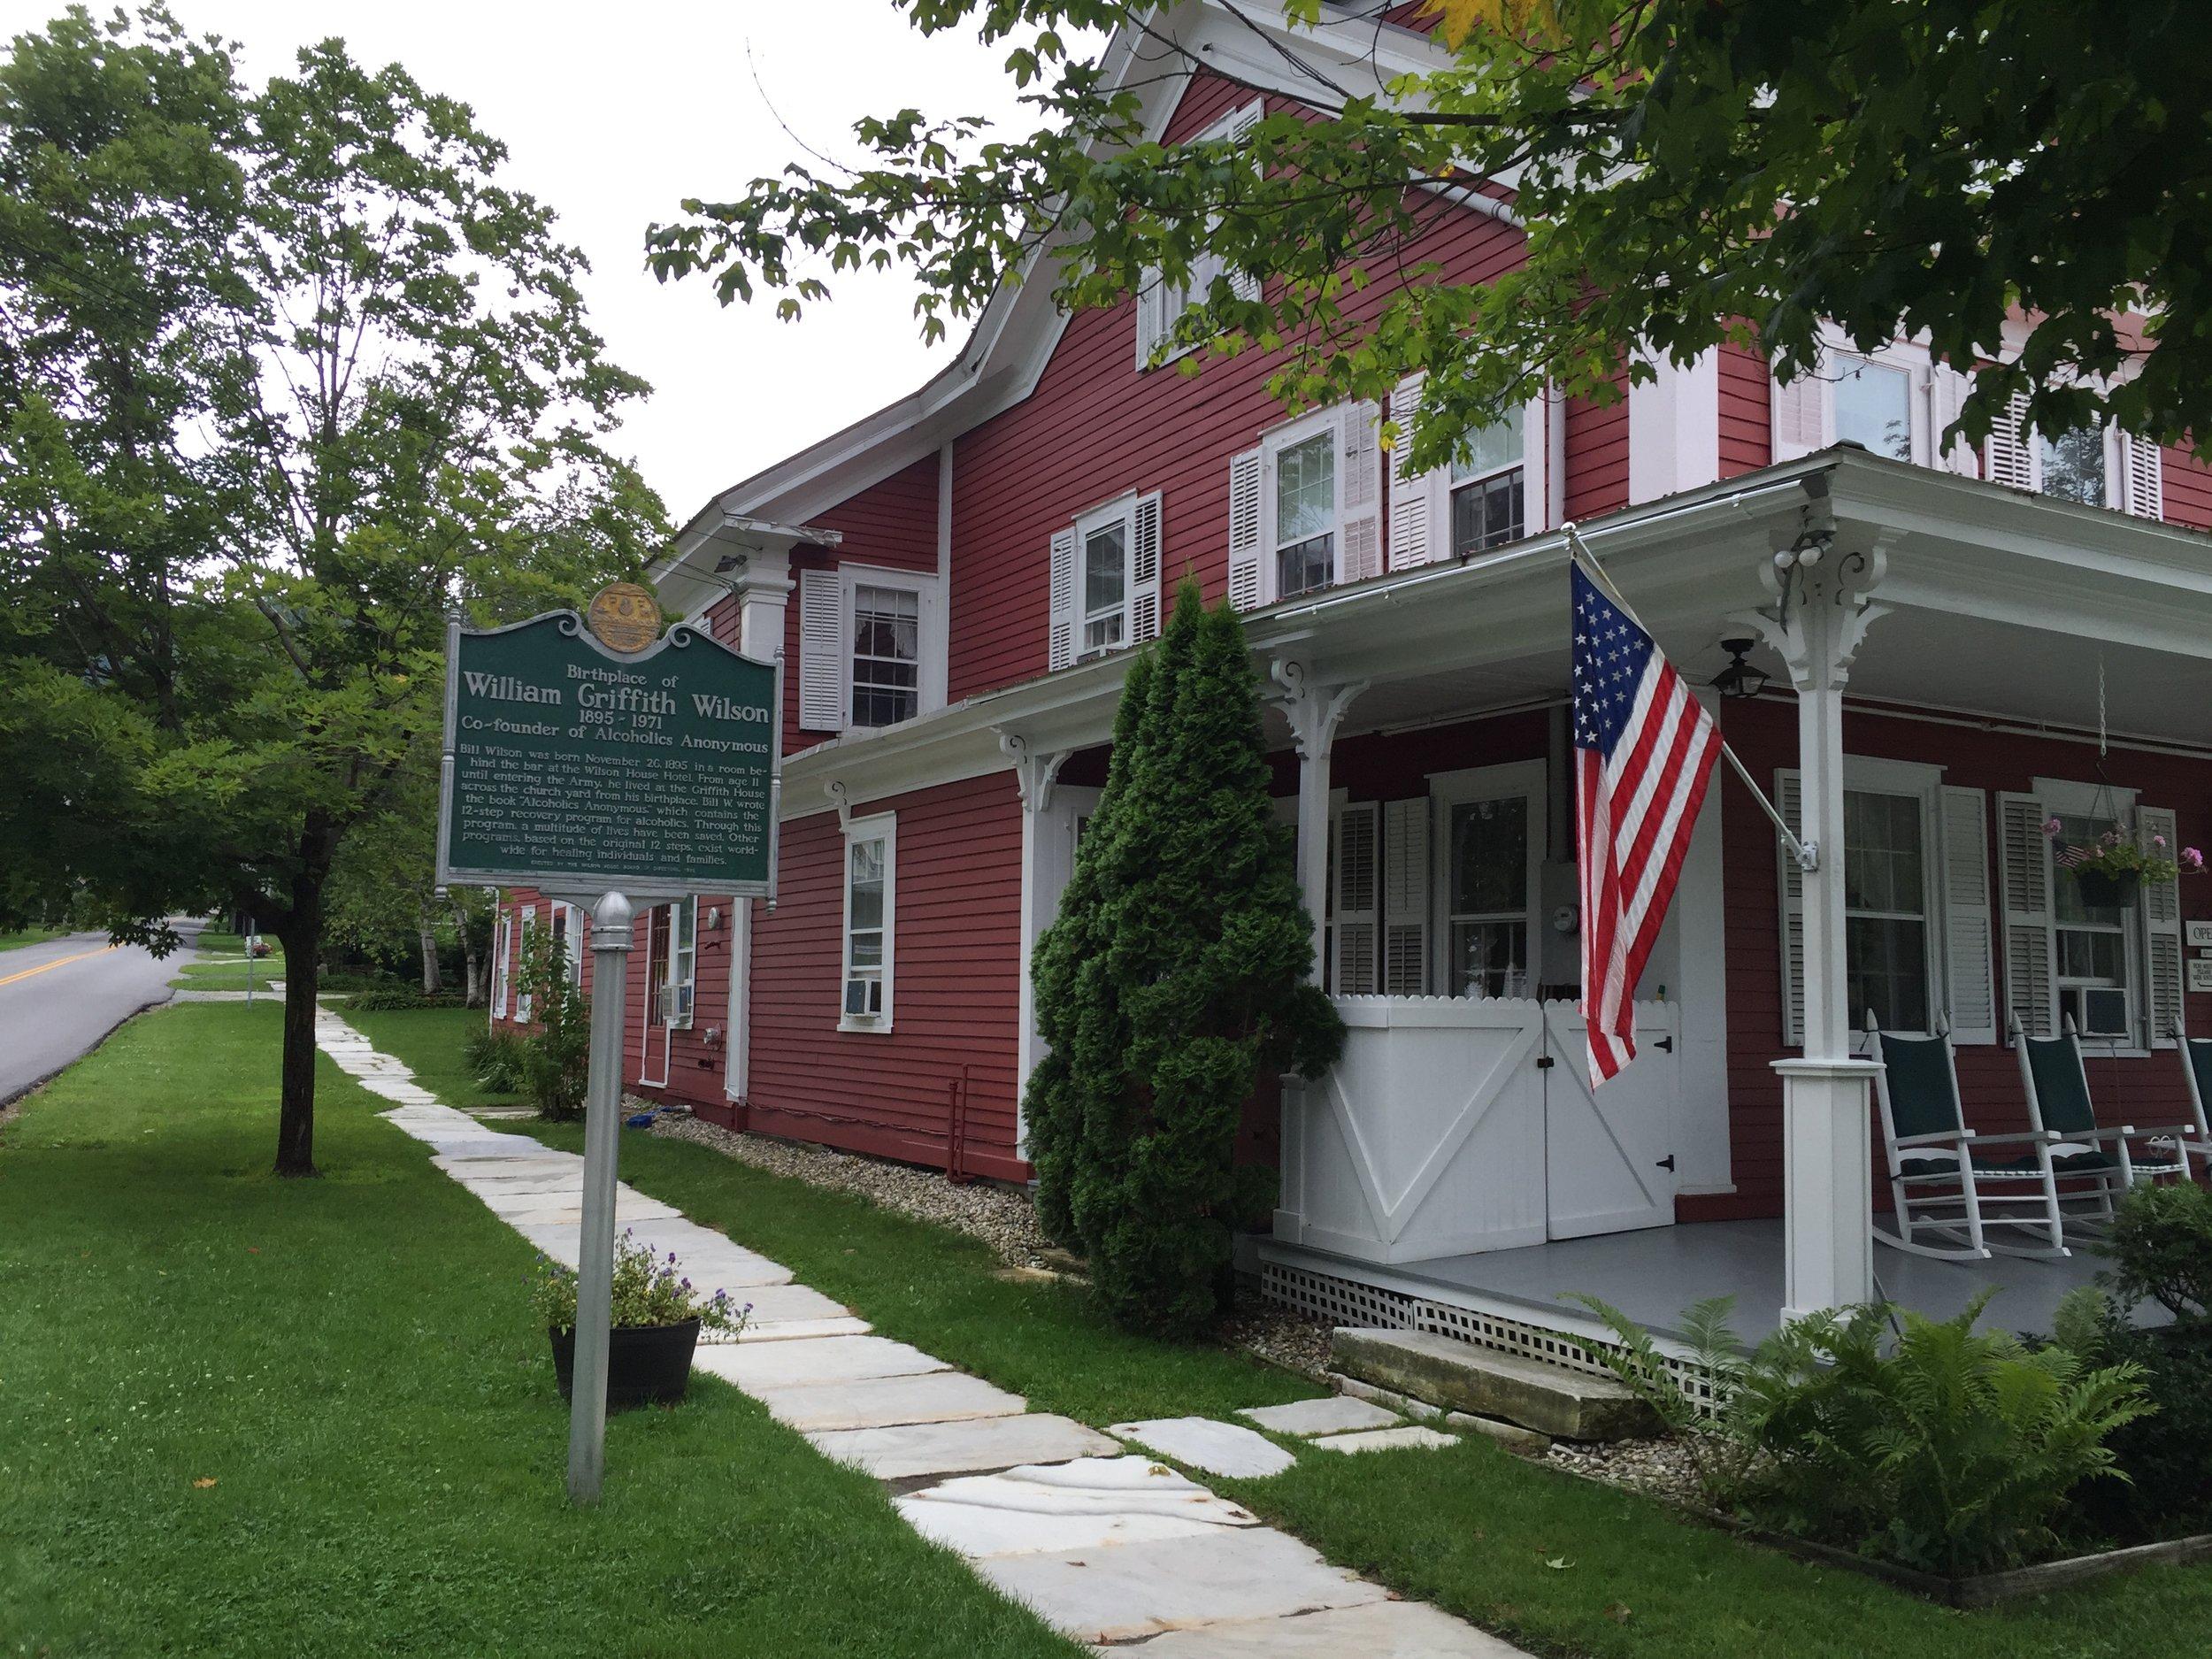 Bill Wilson's House Dorset Vermont